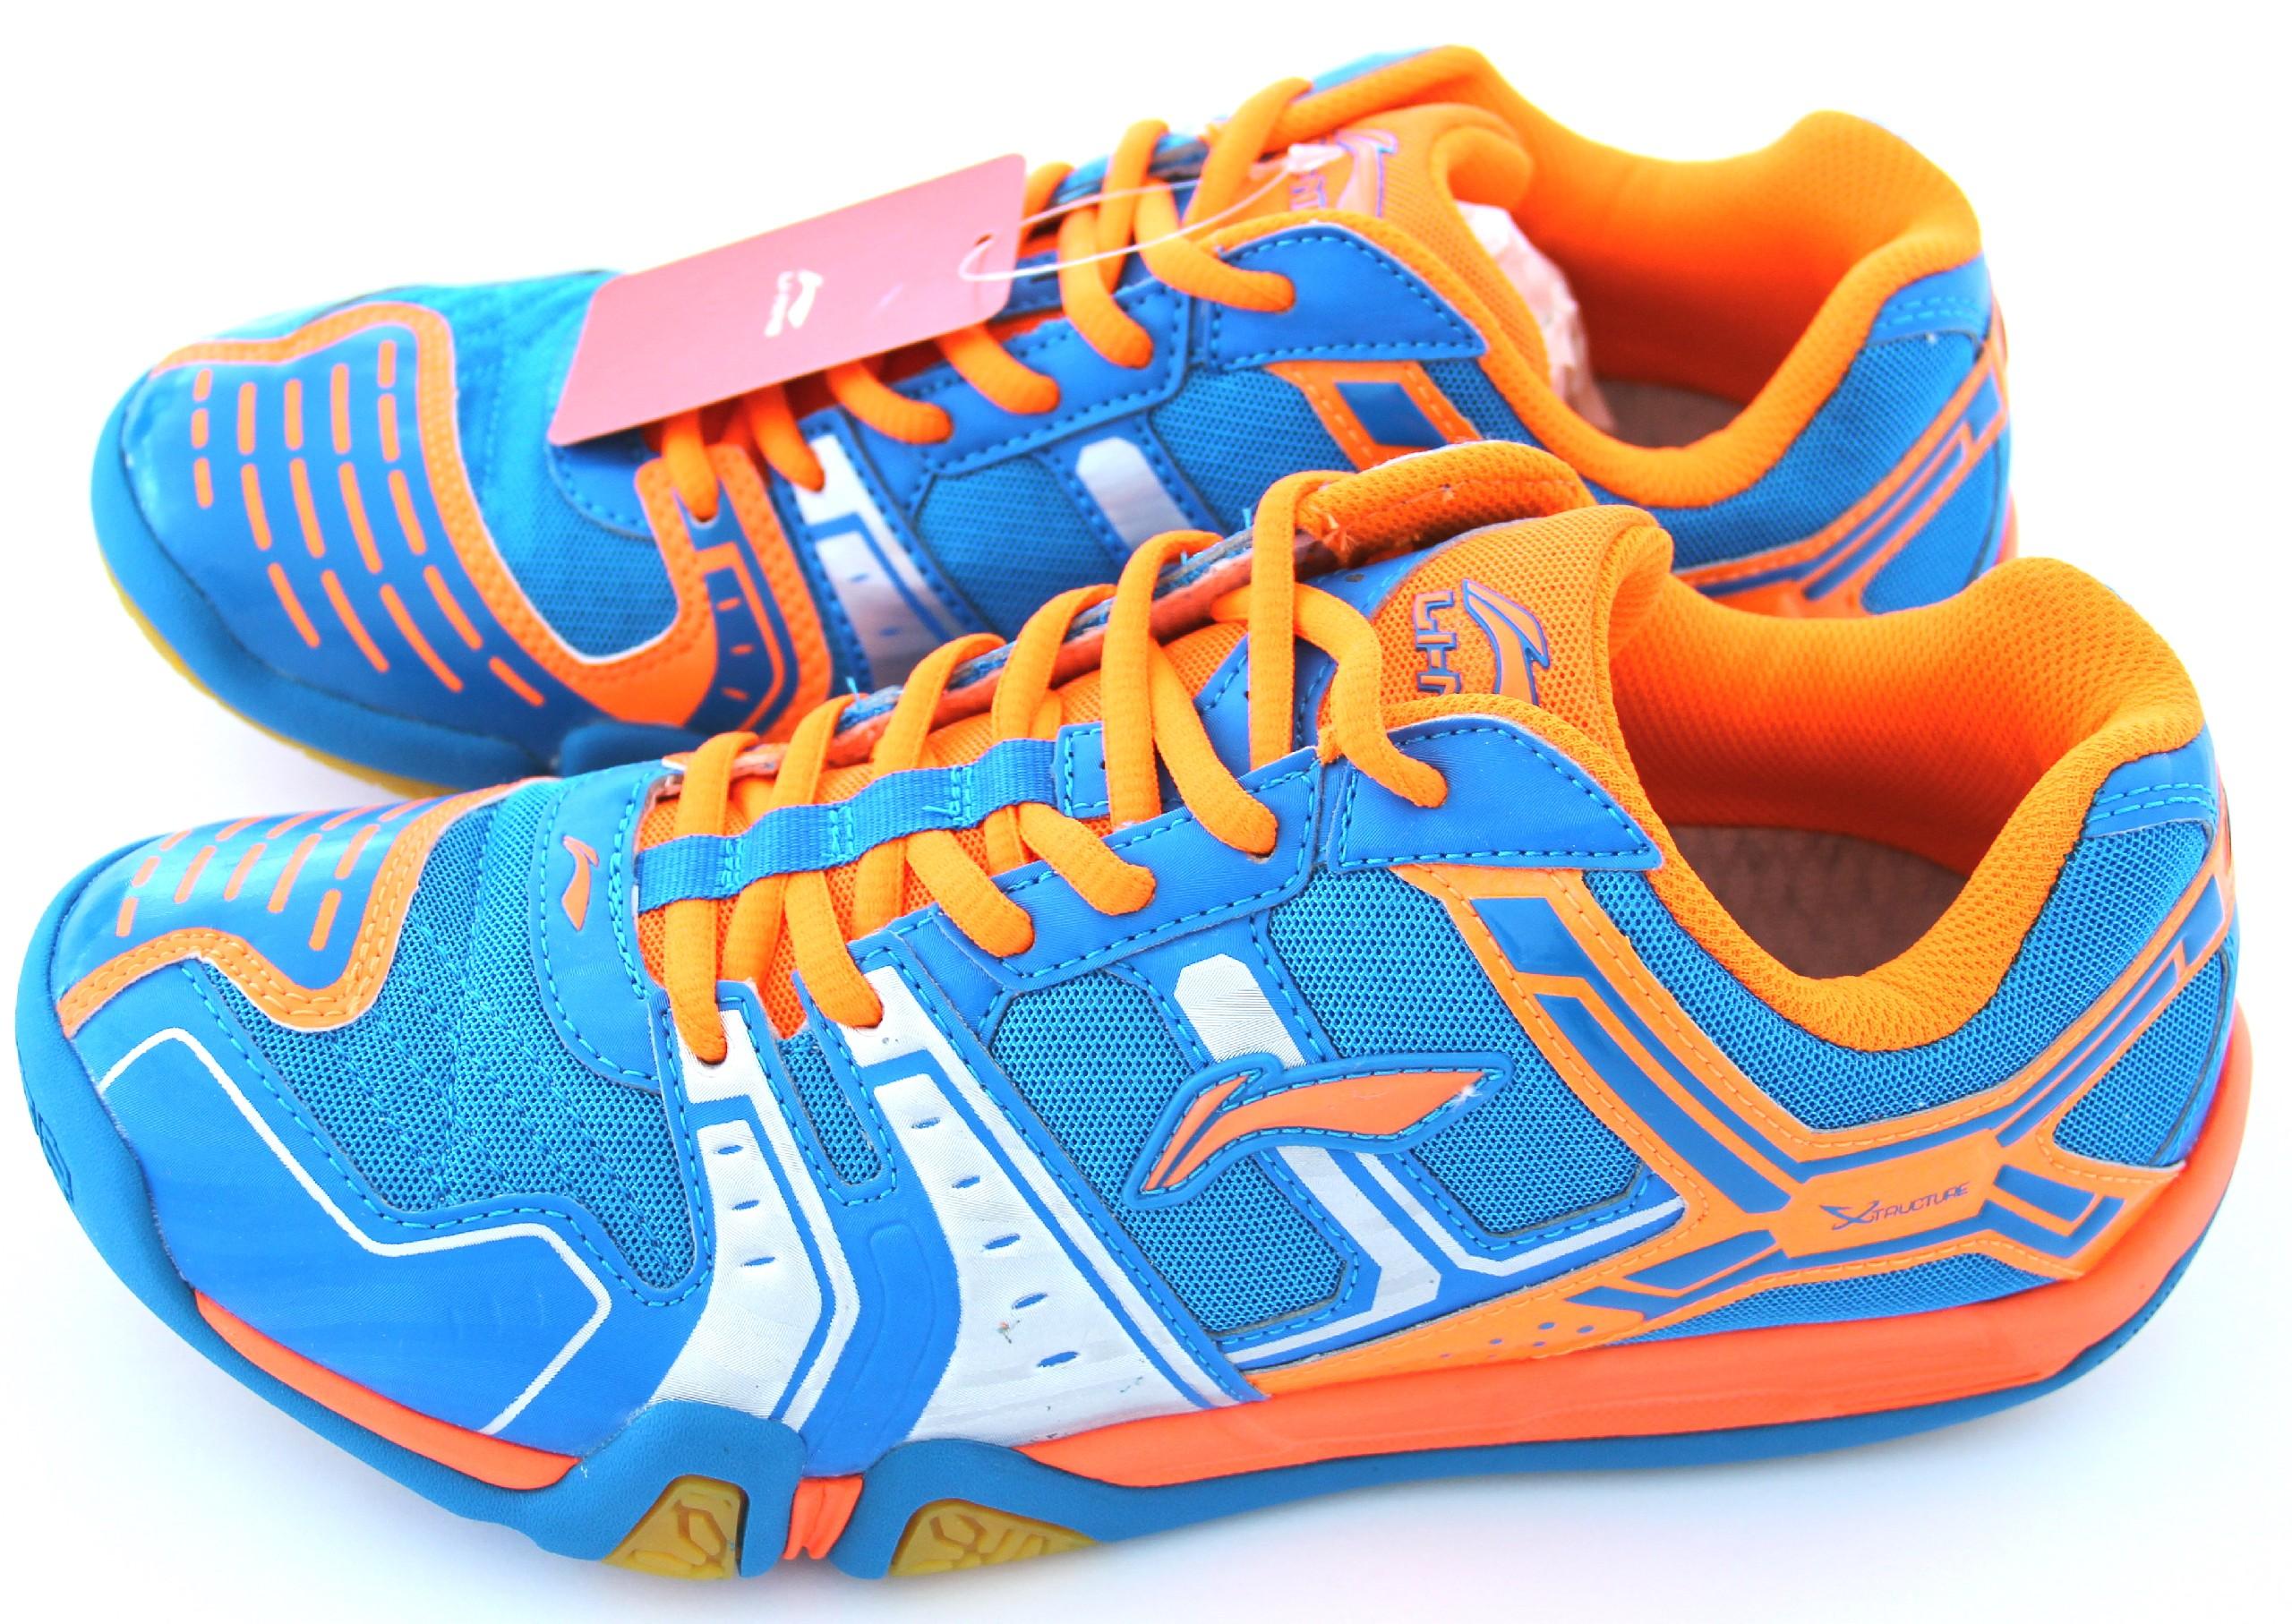 LI-NING Metall X STORM I, Flash Blu, Pánská sálová obuv Velikost: 44